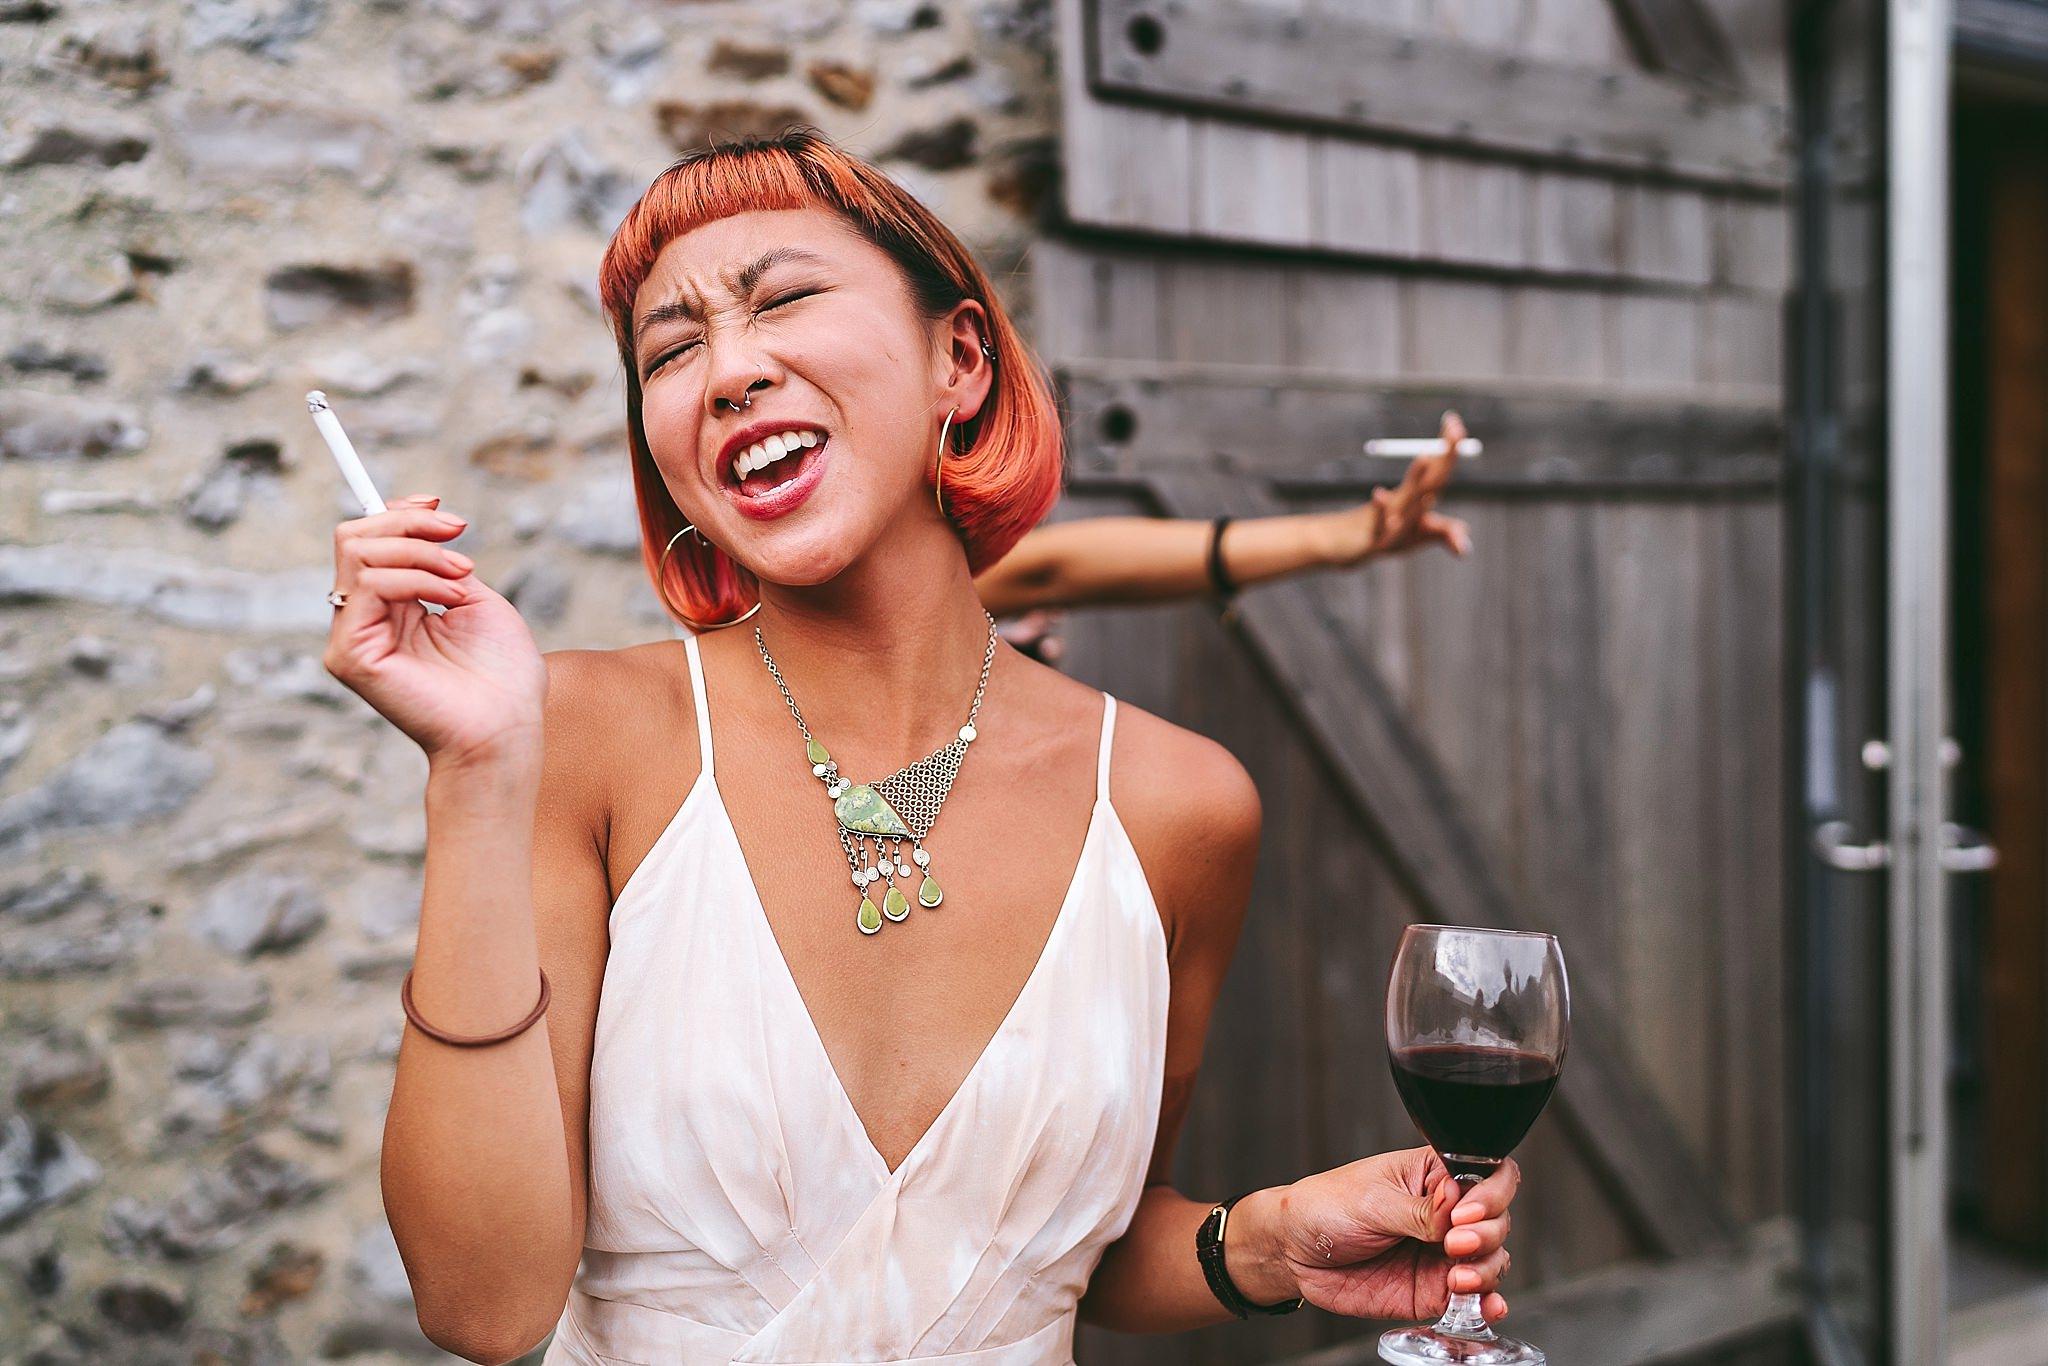 aga-tomaszek-wedding-photographer-cardiff-2016_1073